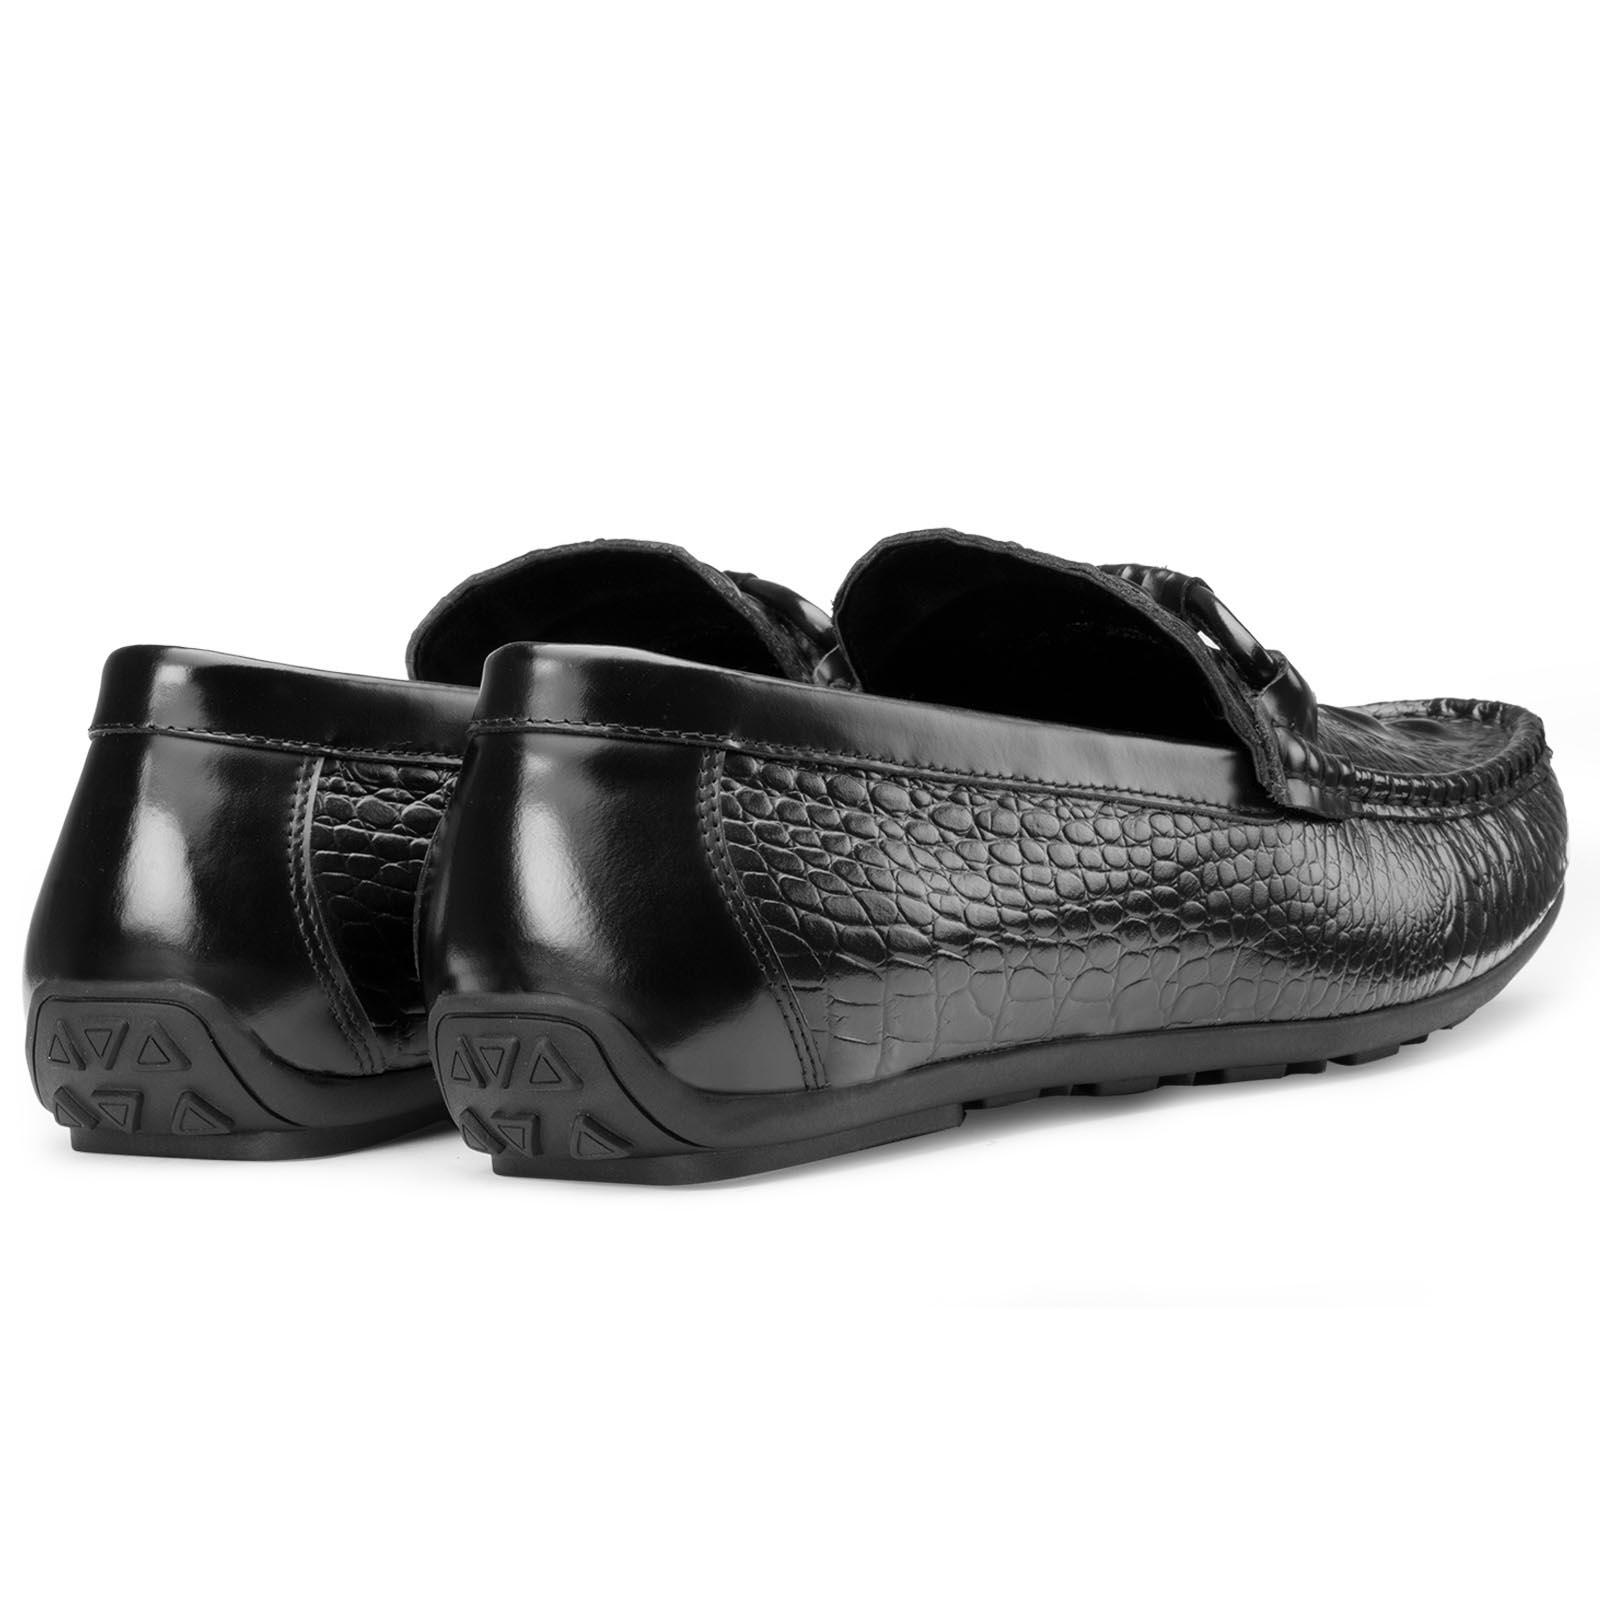 Croc Black Moccasins